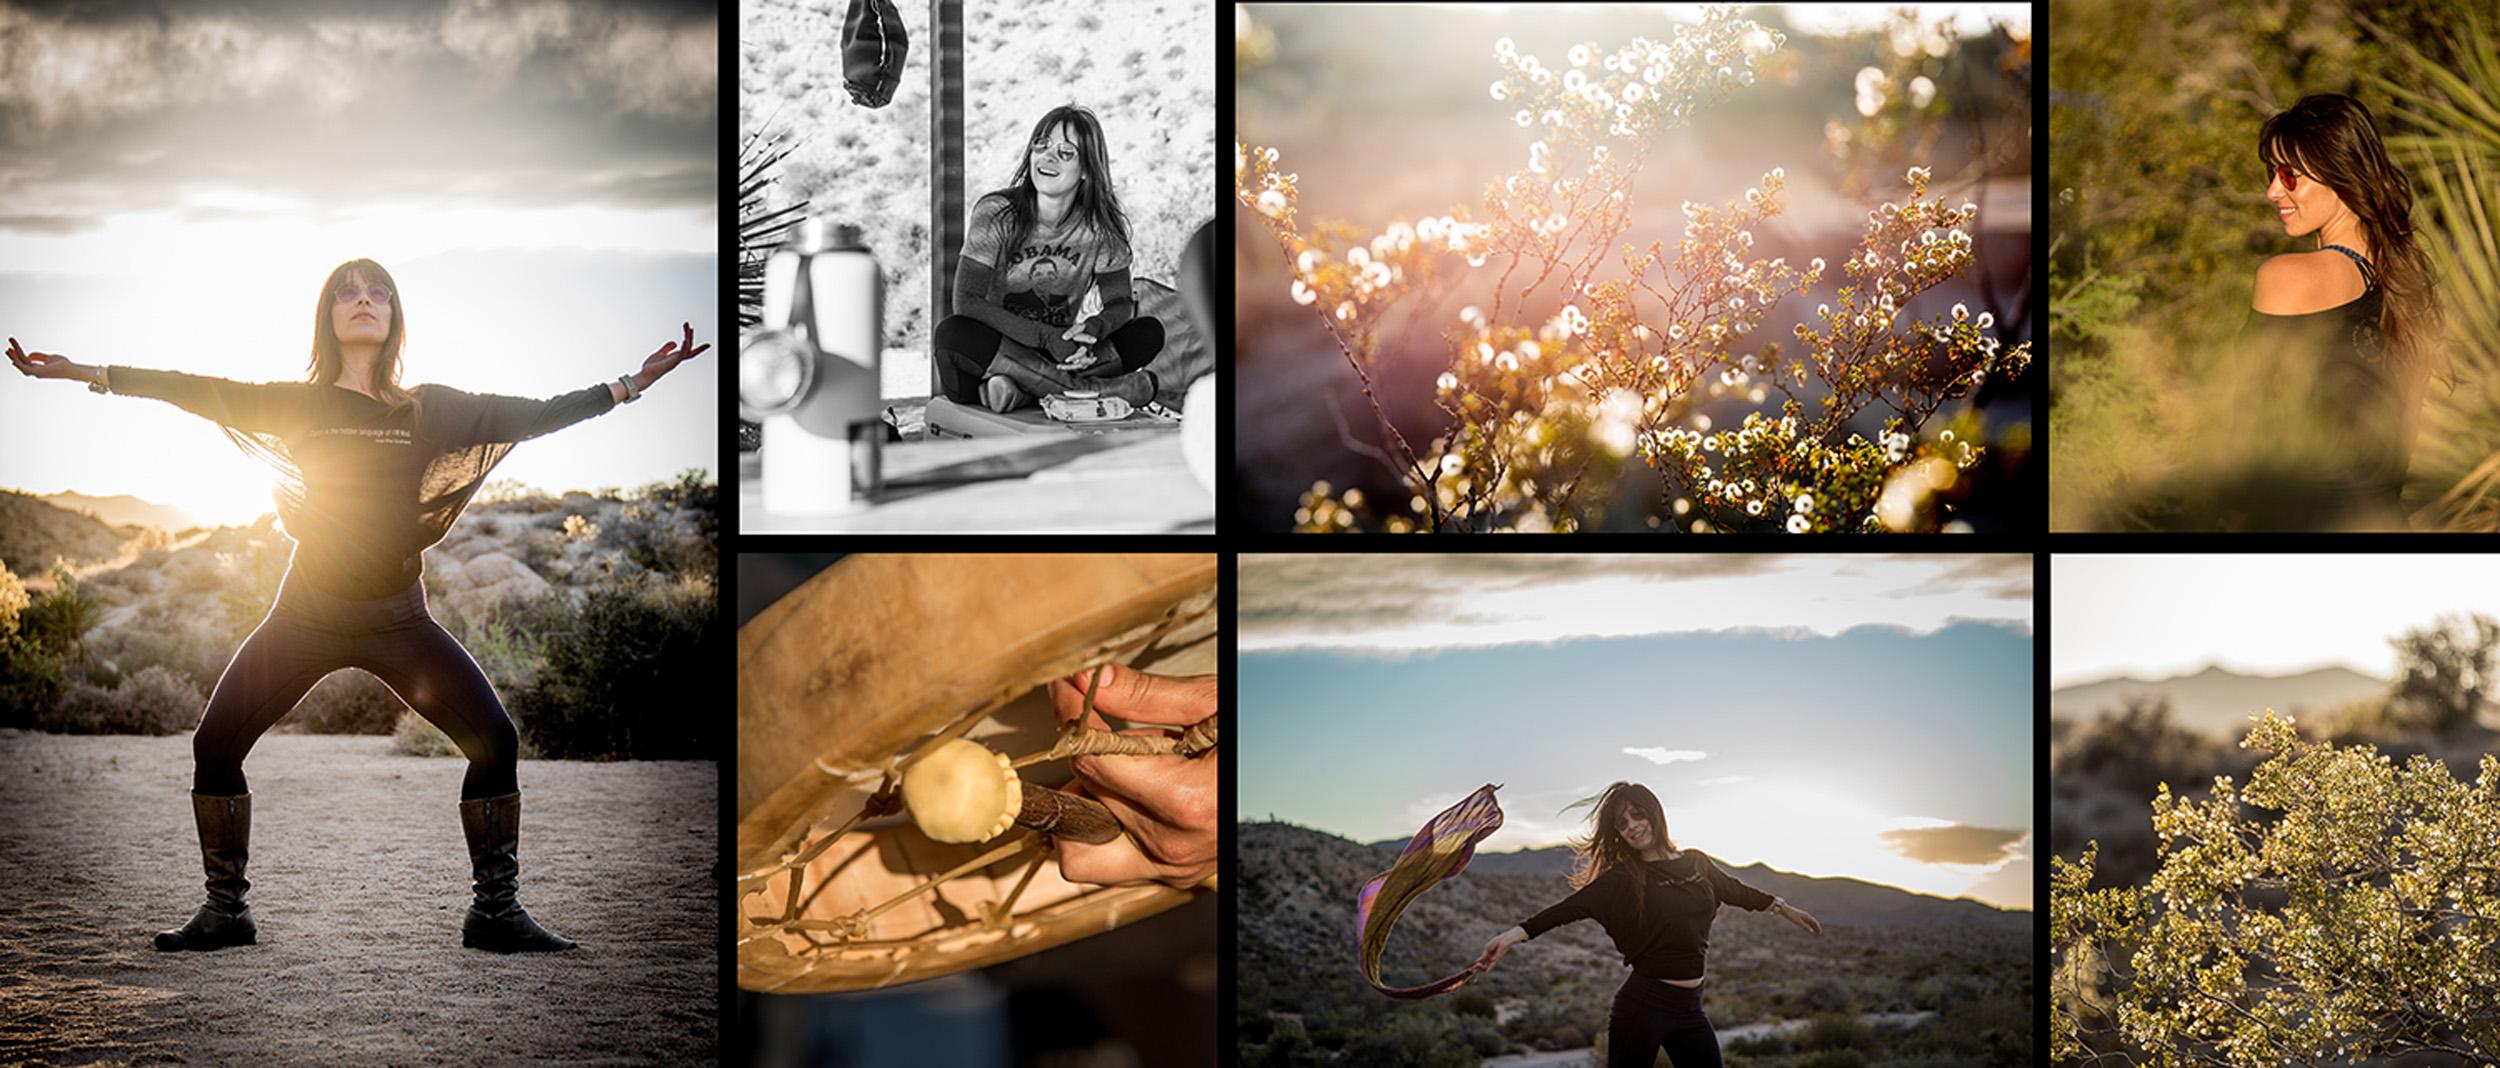 Britt_Nemeth_Studios_PhotographyLive_Events_Elopements_Launches_Ceremony_Gatherings_Yoga_Retreat119.jpg